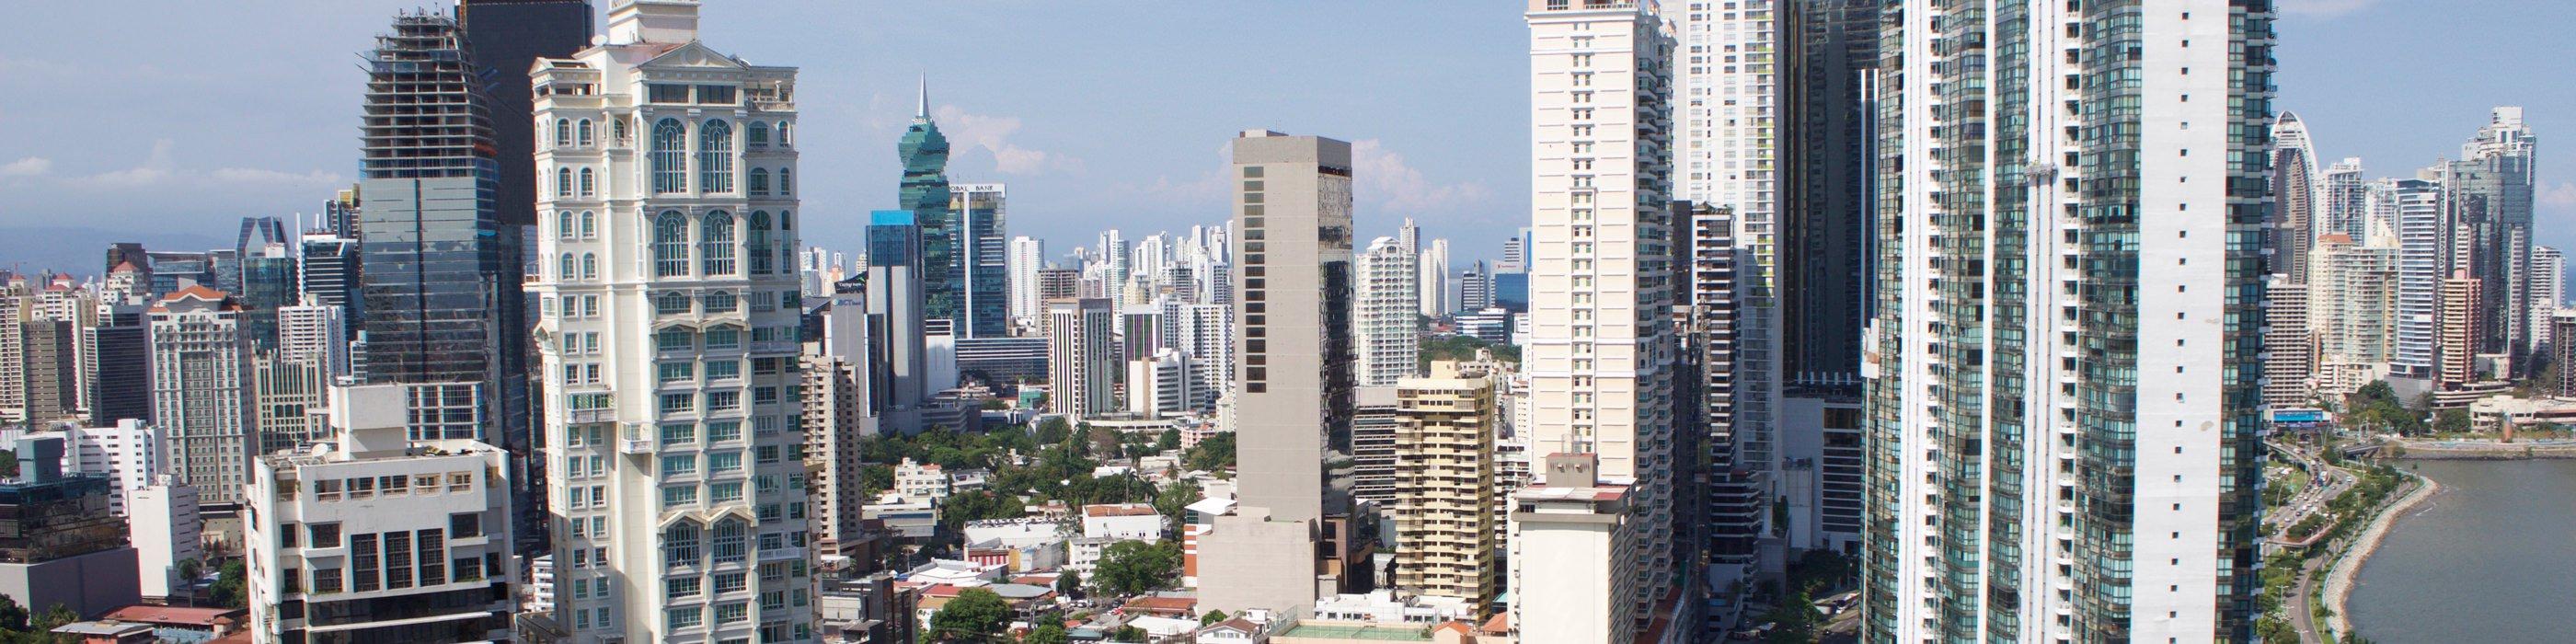 Panama_City_Panama_by_Equity.jpg